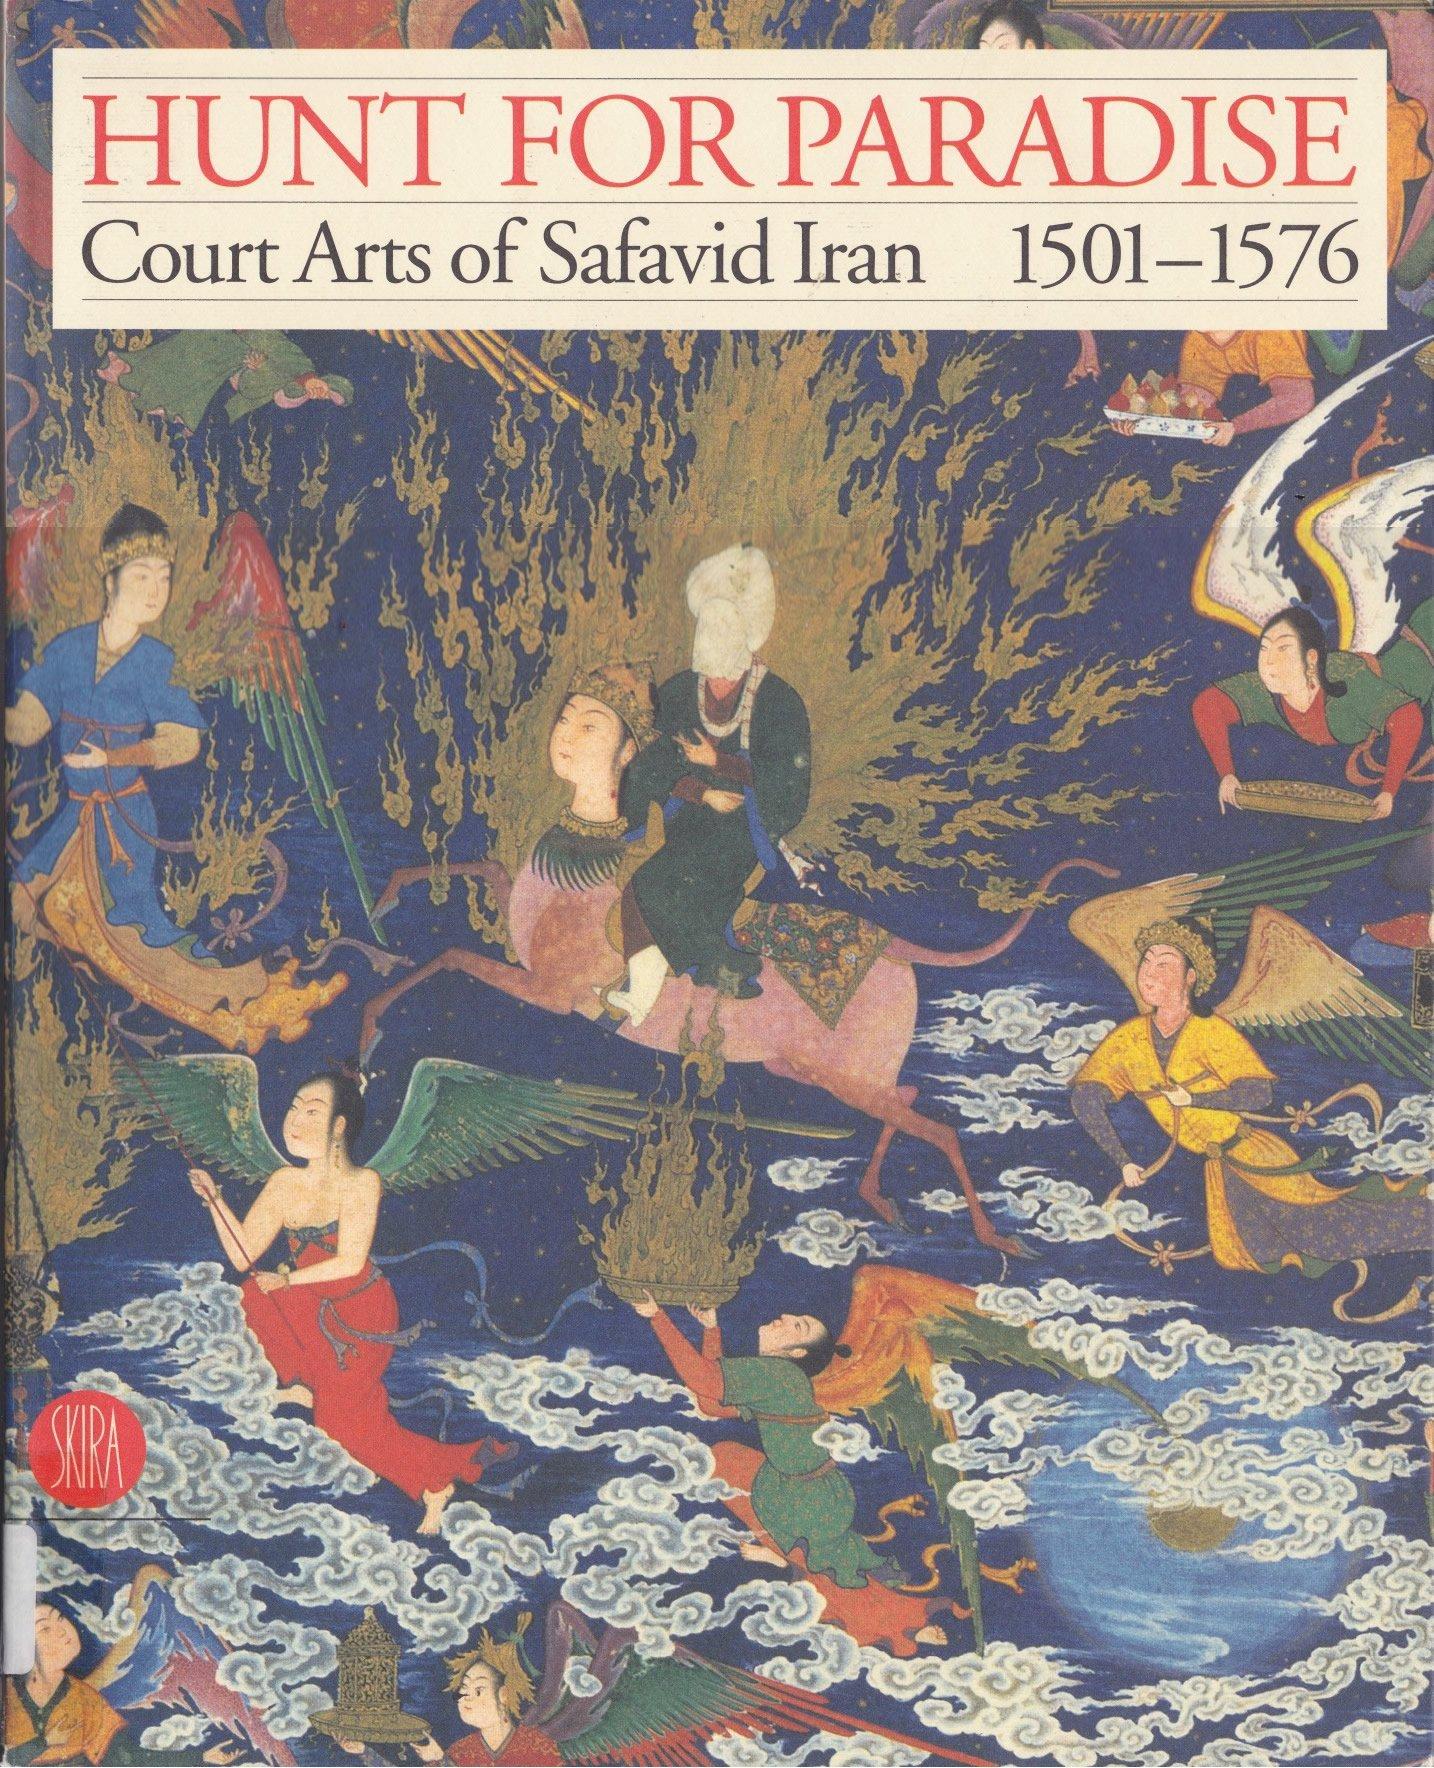 Hunt for Paradise: Court Arts of Safavid Iran 1501-1576: Amazon co